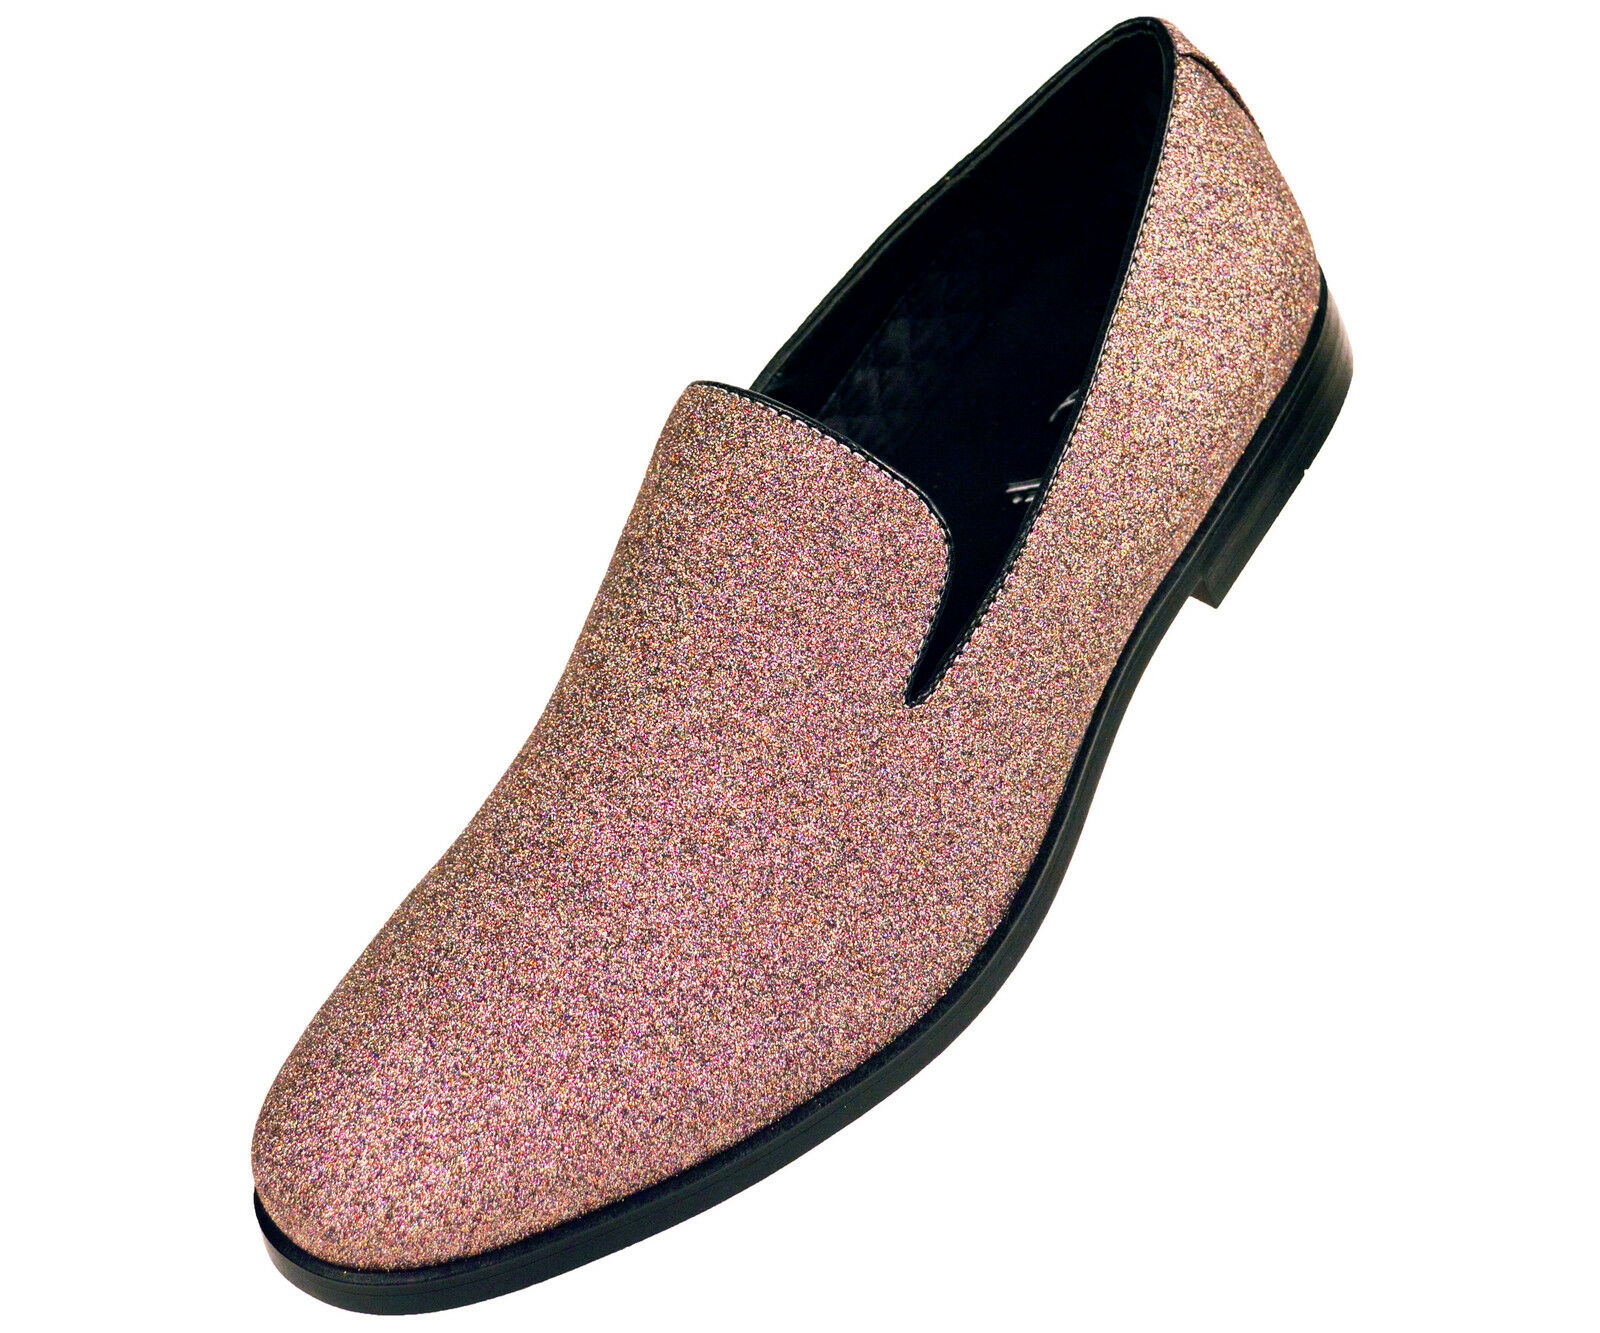 Amali Mens Multi Color Glitter Chinese Slipper Slip On Tux Dress Shoe Busby-462